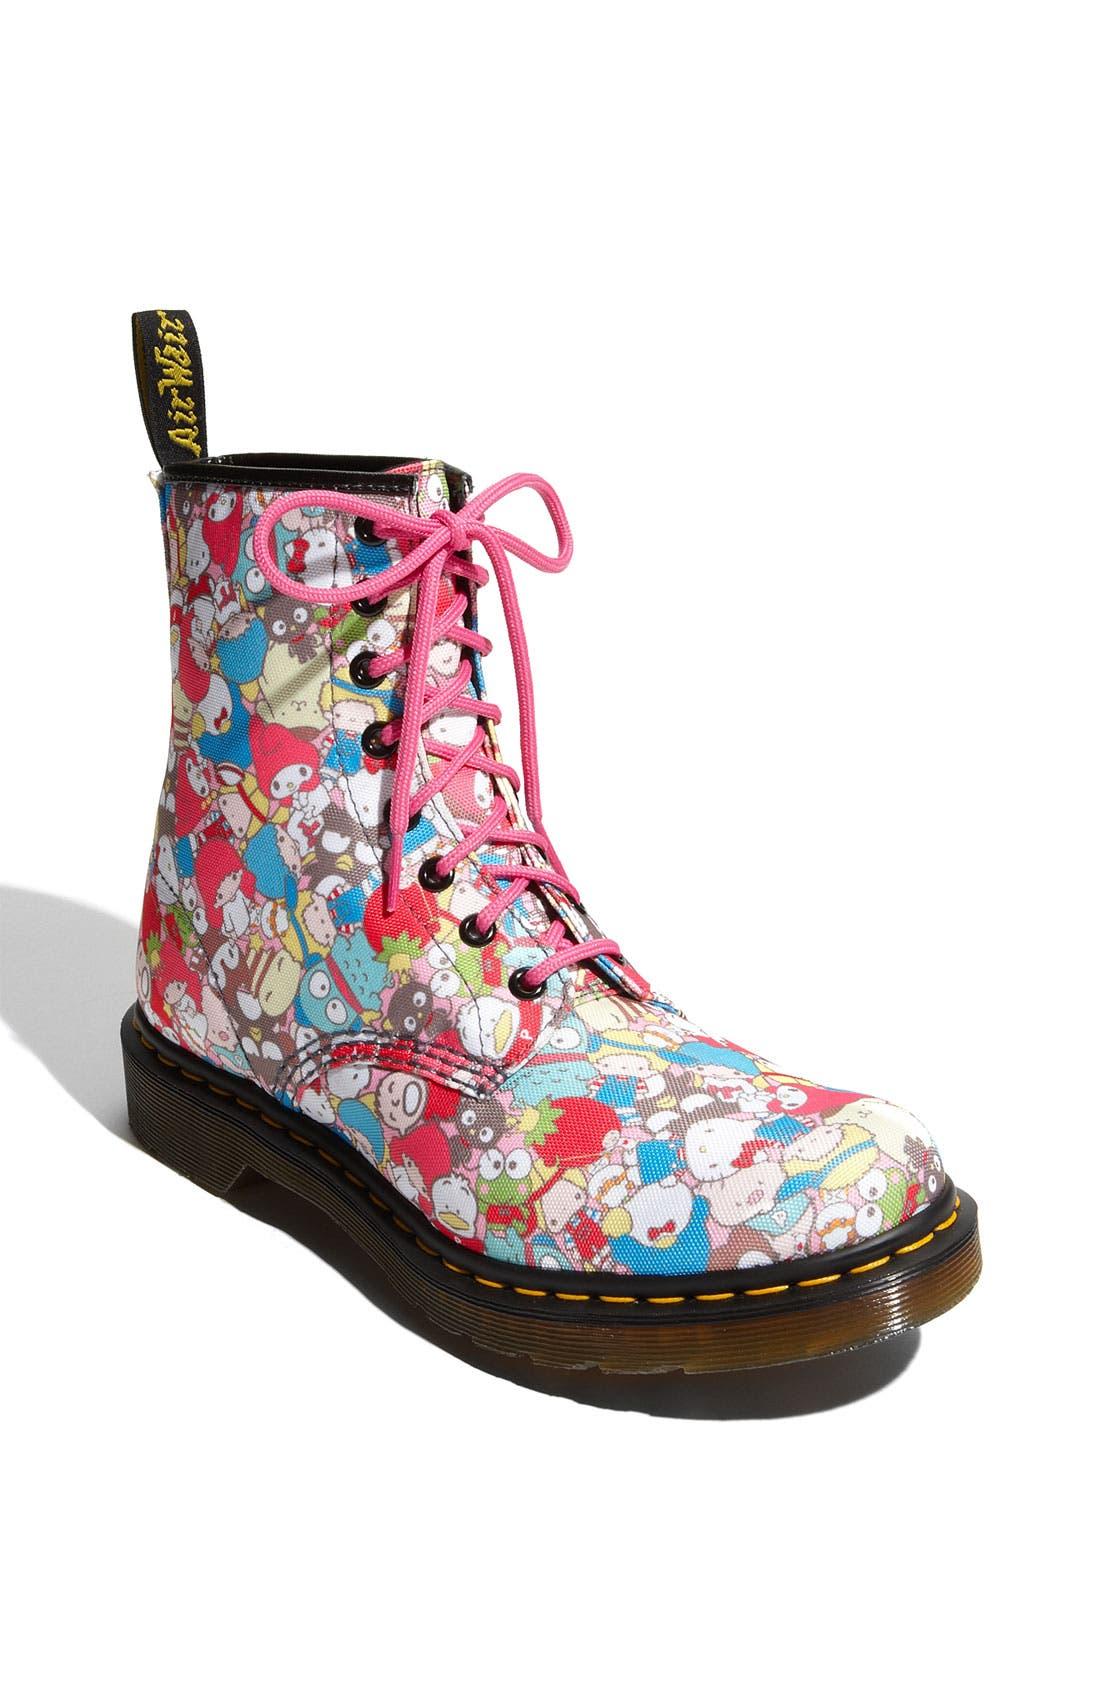 Main Image - Dr. Martens 'Sanrio' Boot